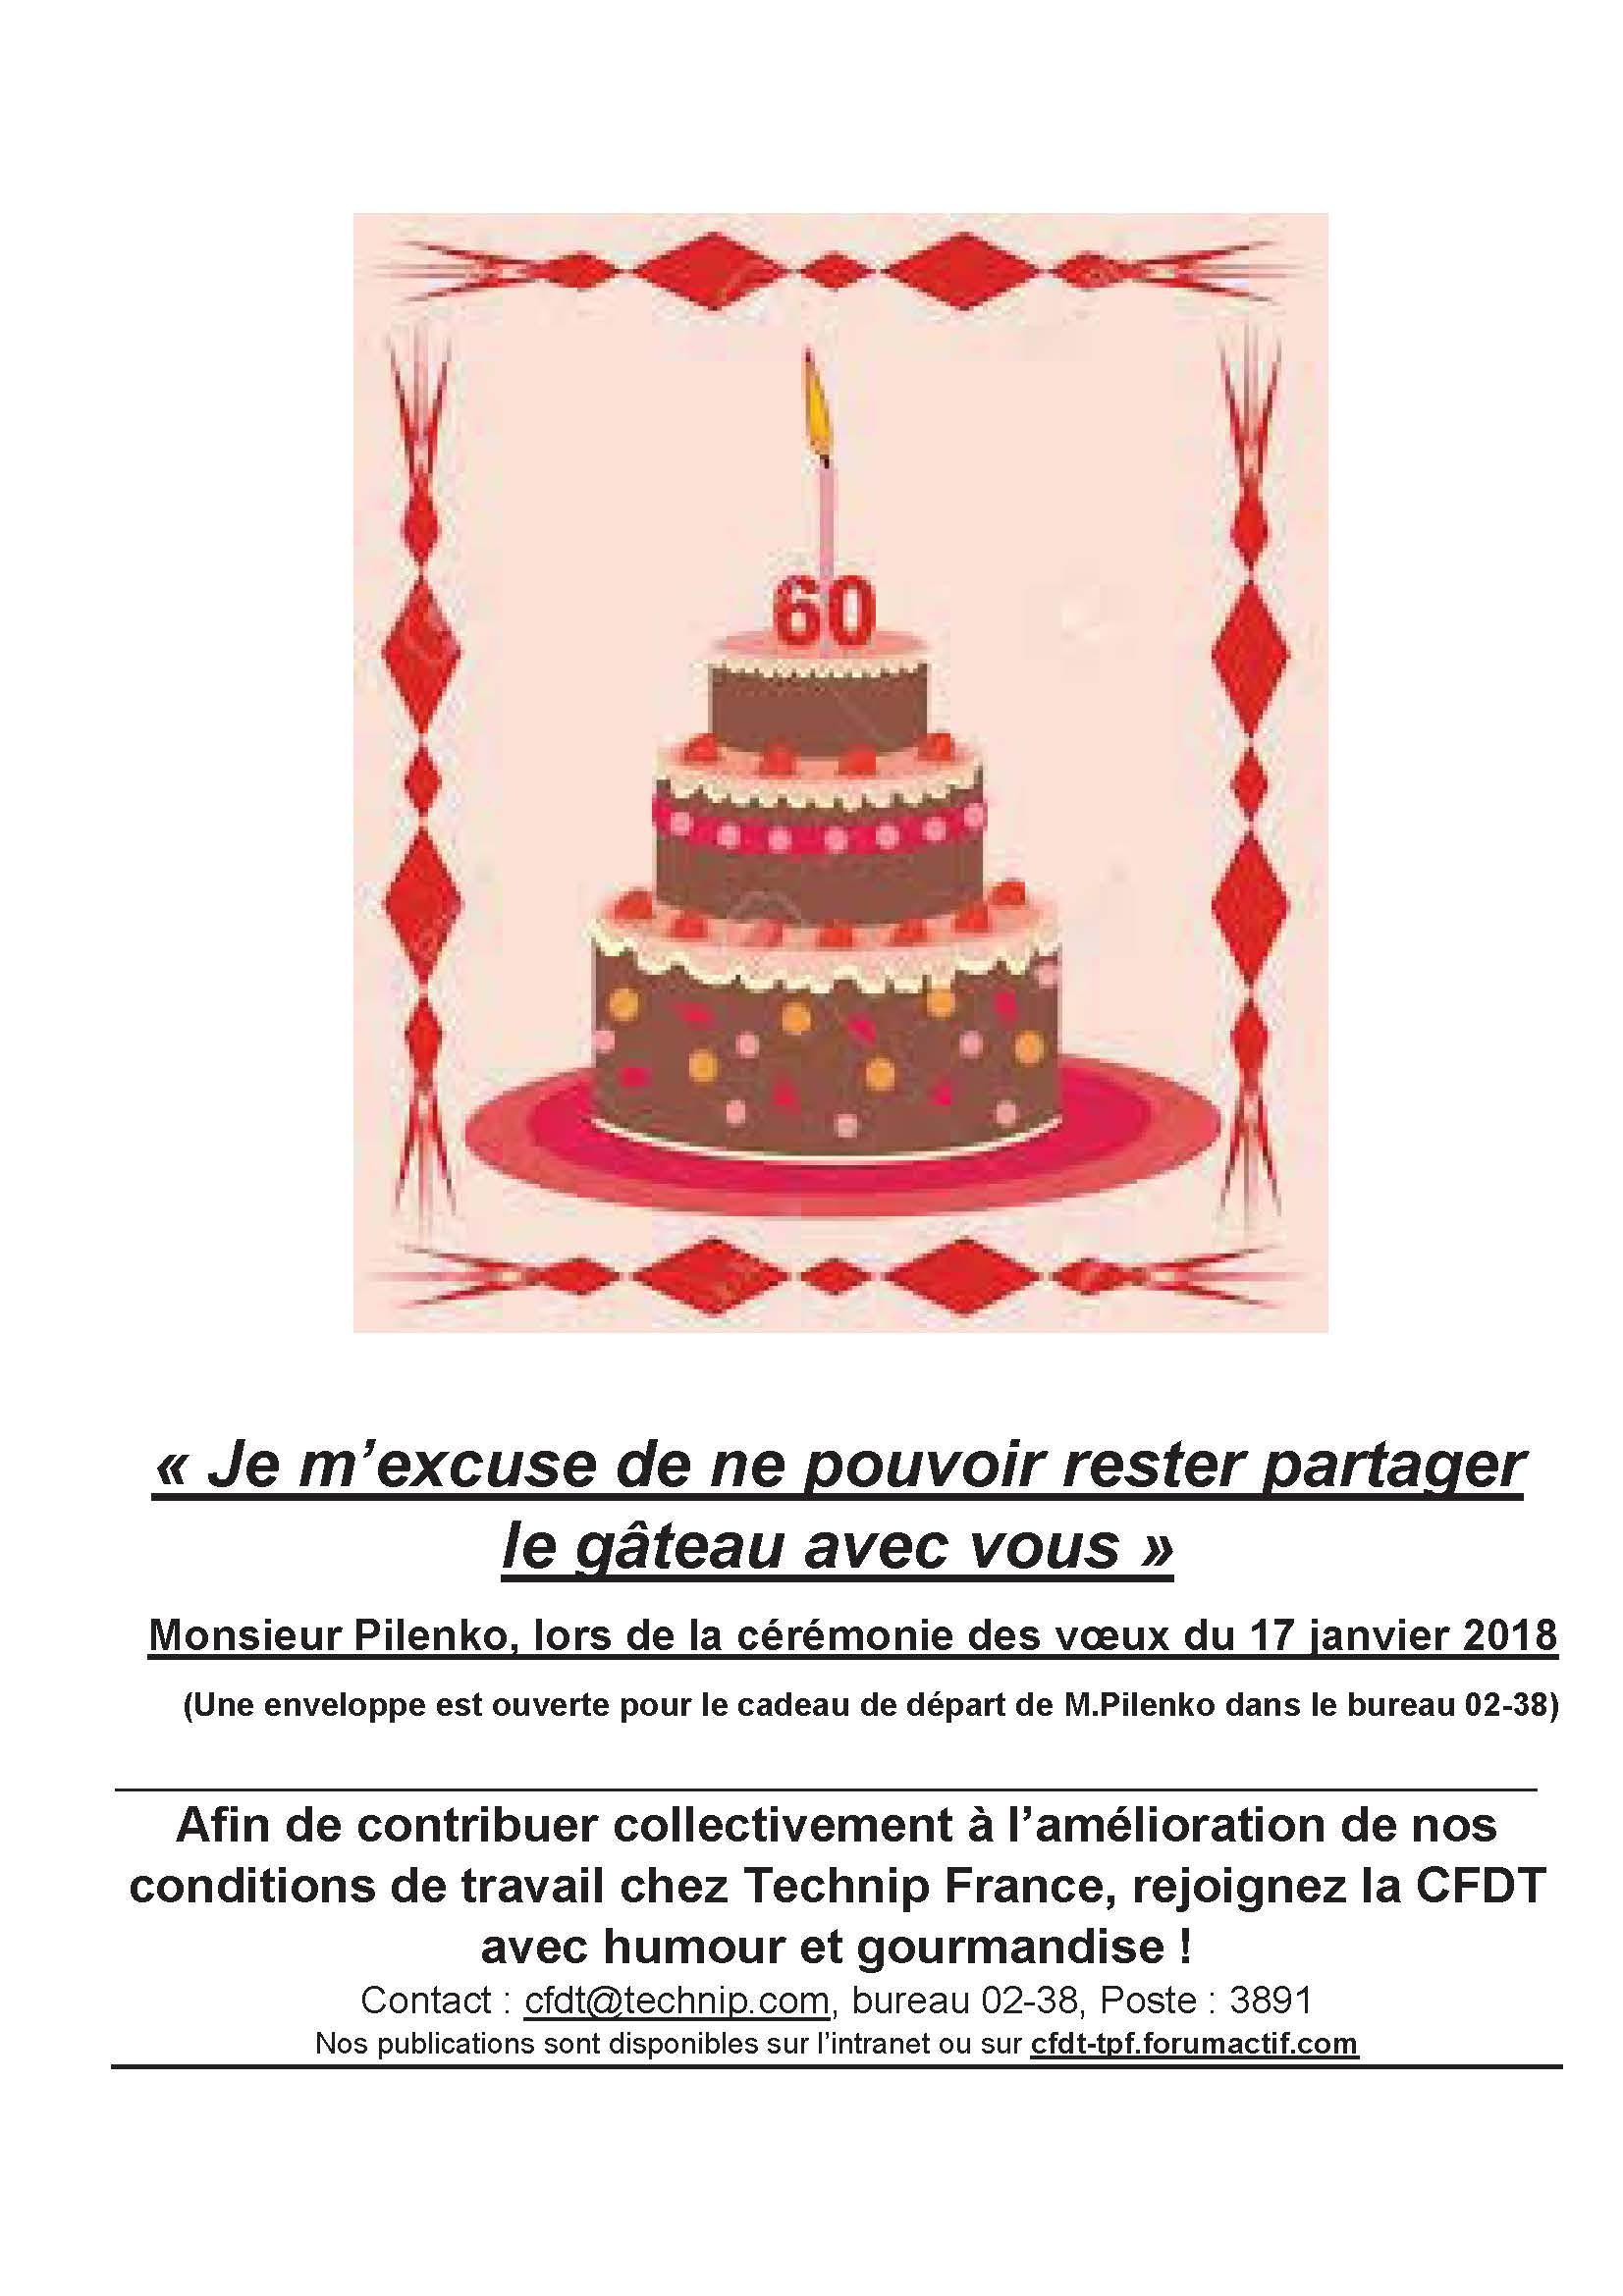 (2018-05-25) - TECHNIP FRANCE A 60 ANS ! BON ANNIVERSAIRE Tract_43